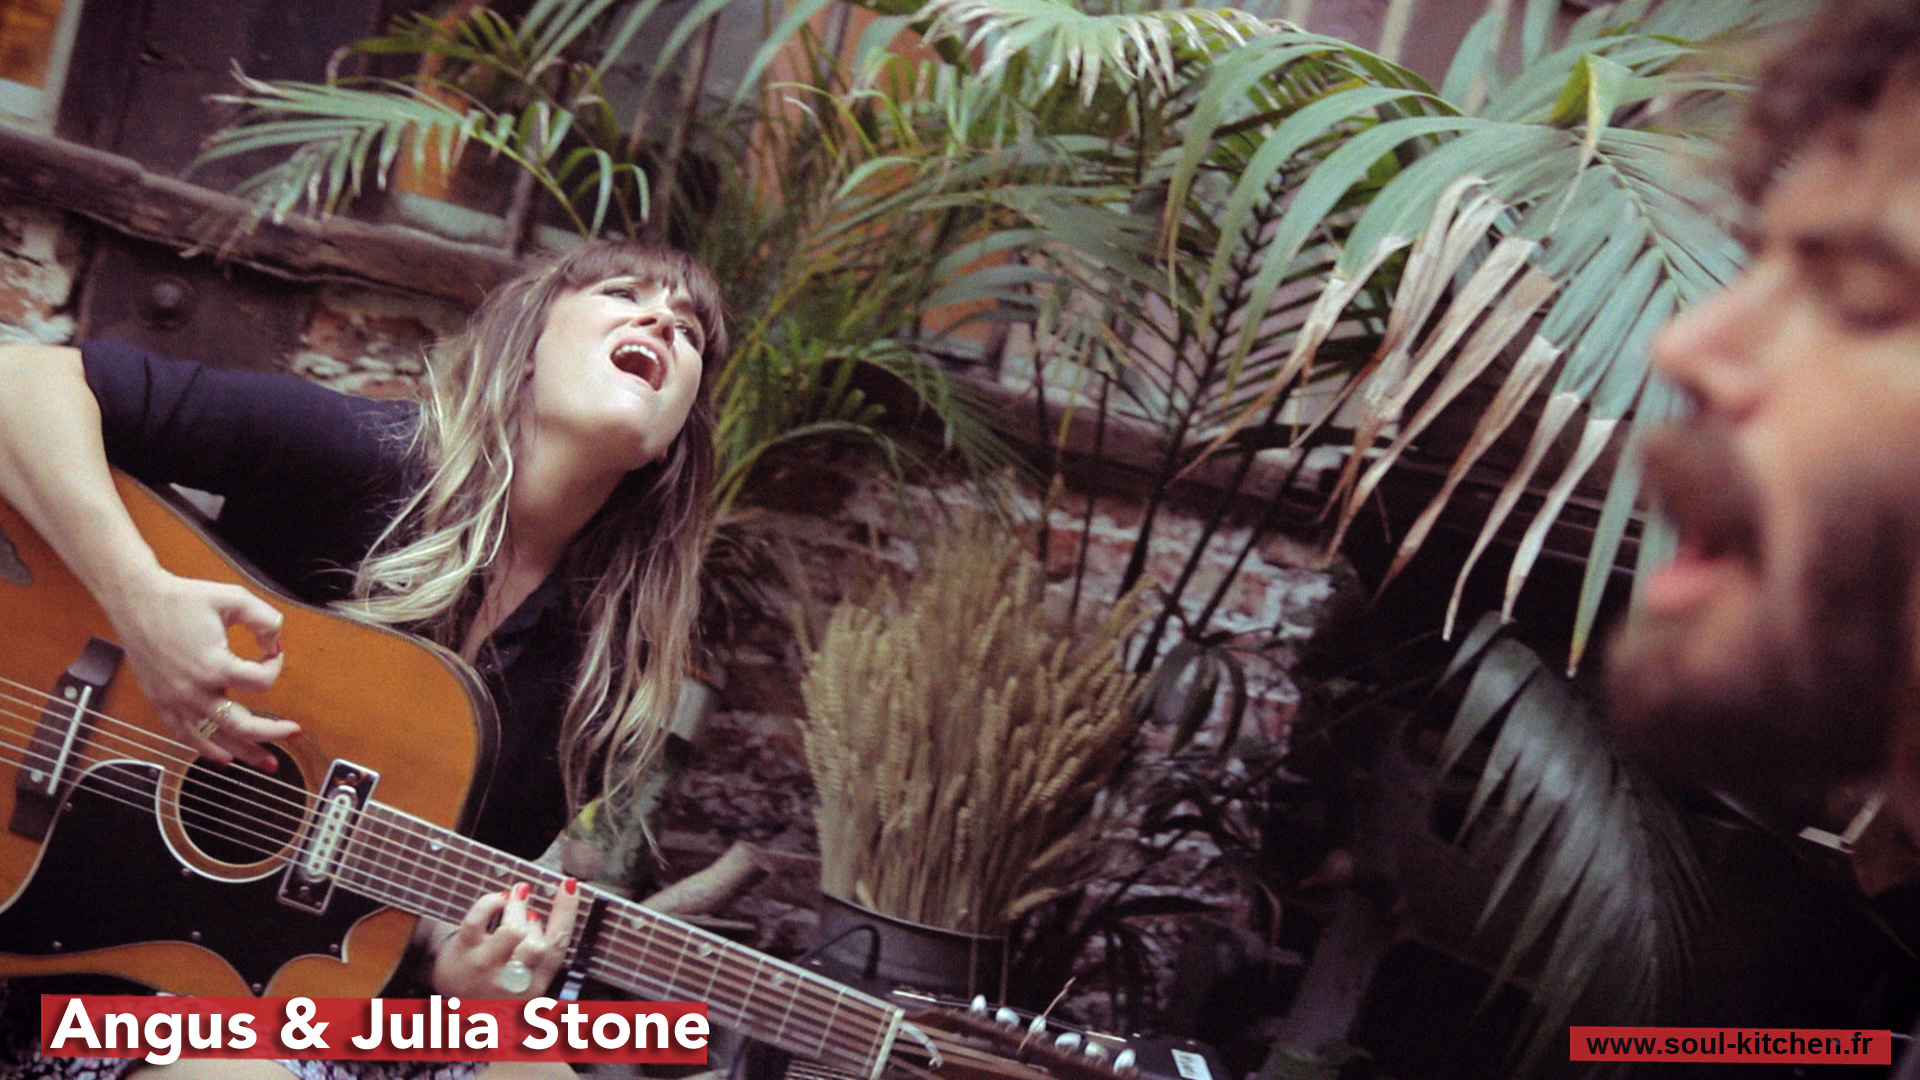 Angus & Julia Stone – Grizzly Bear